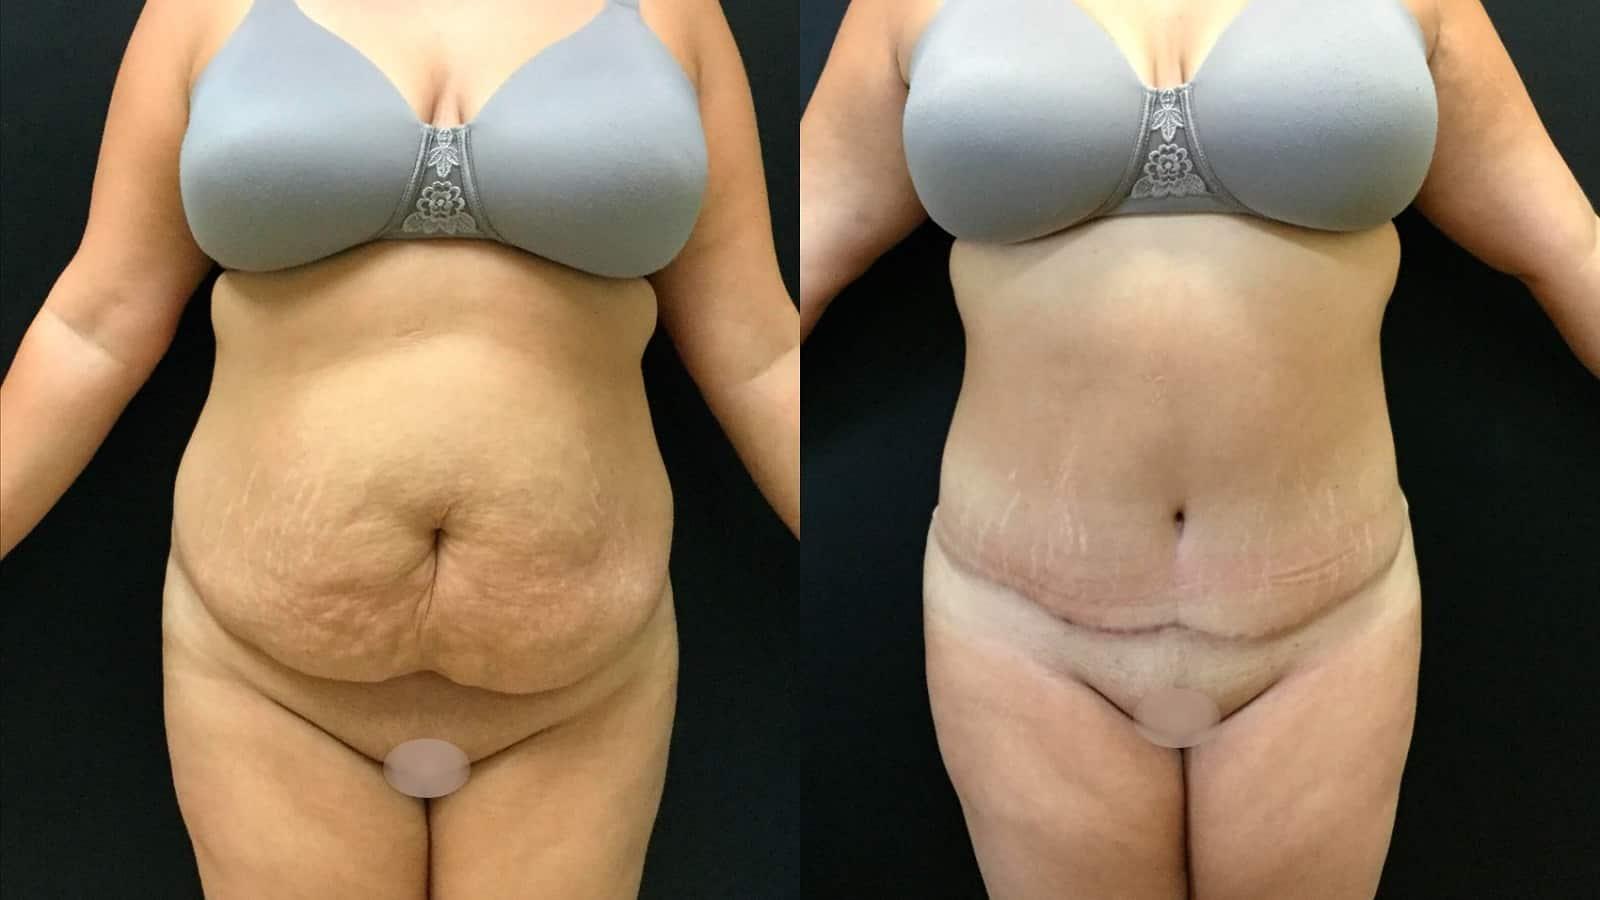 Dr. Meghan McGovern is an expert at tummy tucks